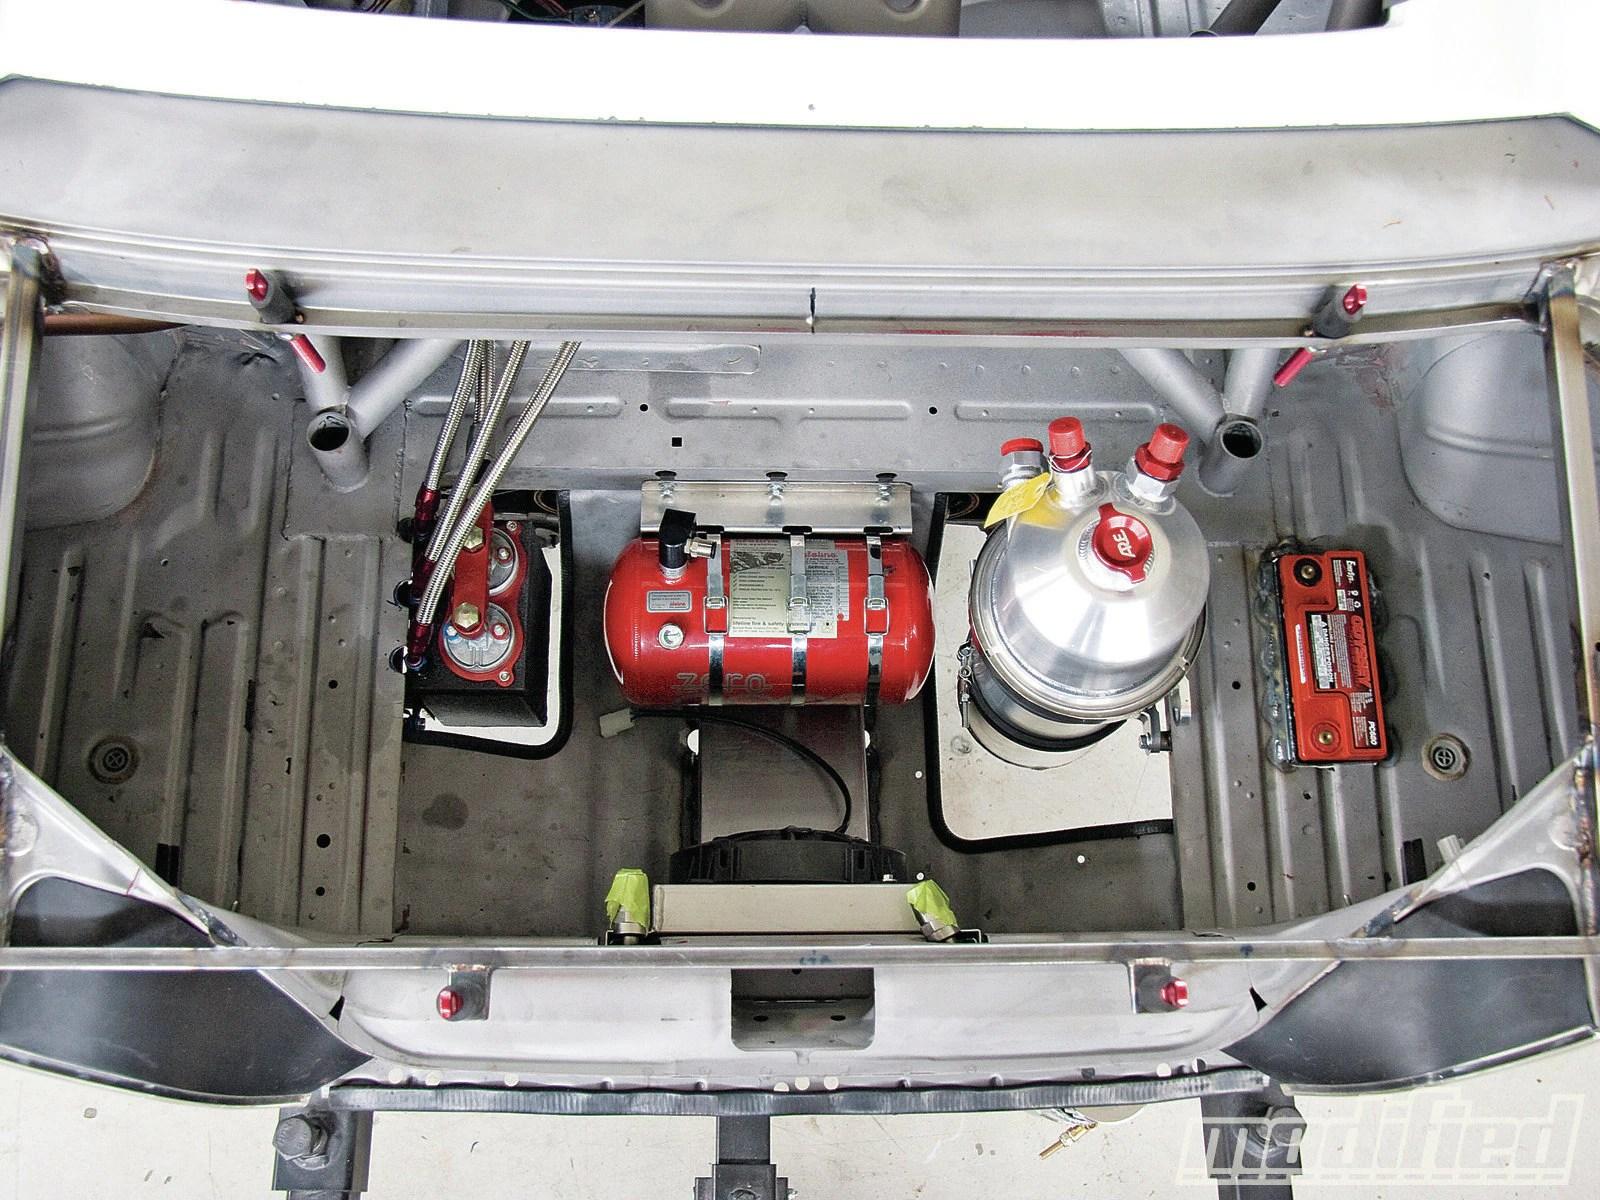 2000 honda s2000 custom fuel system assembly project s2000modp 1203 01 2000 honda s2000 cover [ 1600 x 1200 Pixel ]